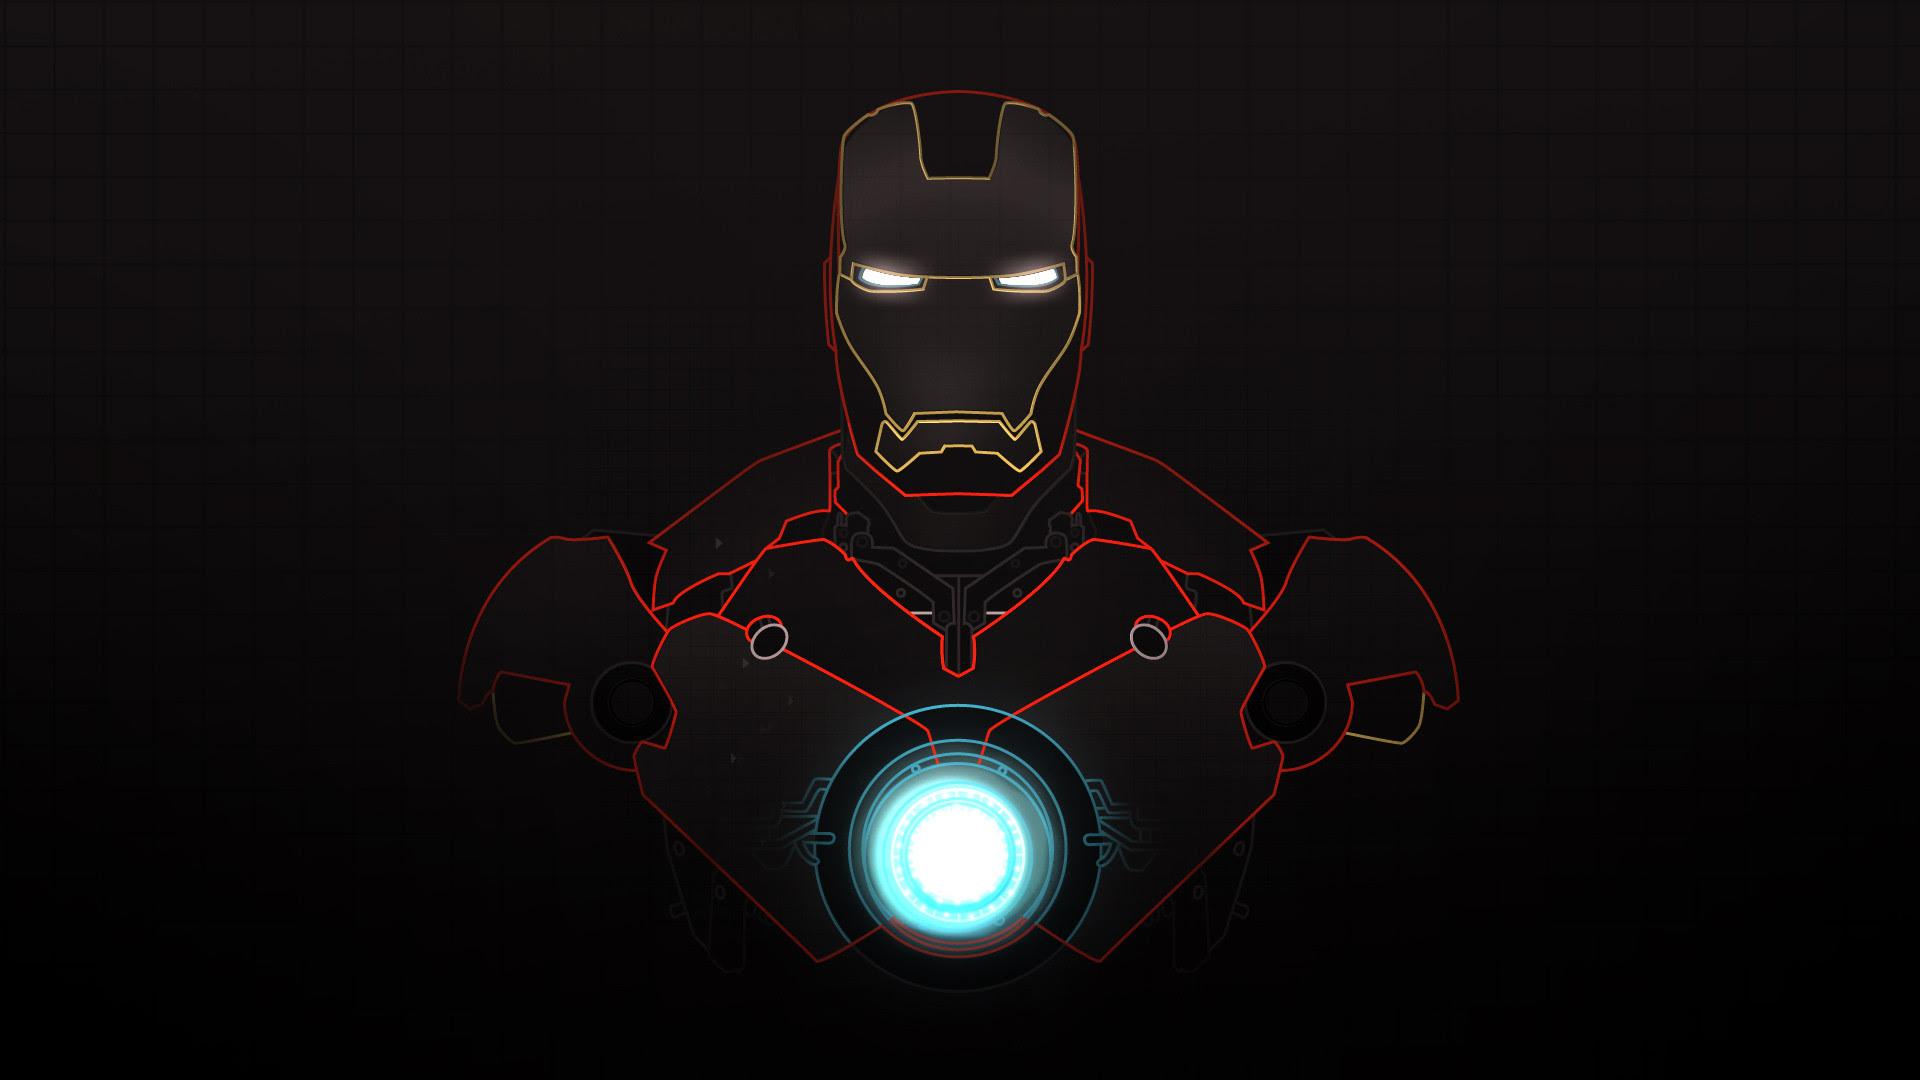 Iron Man Hd Wallpaper 1920x1080 43332